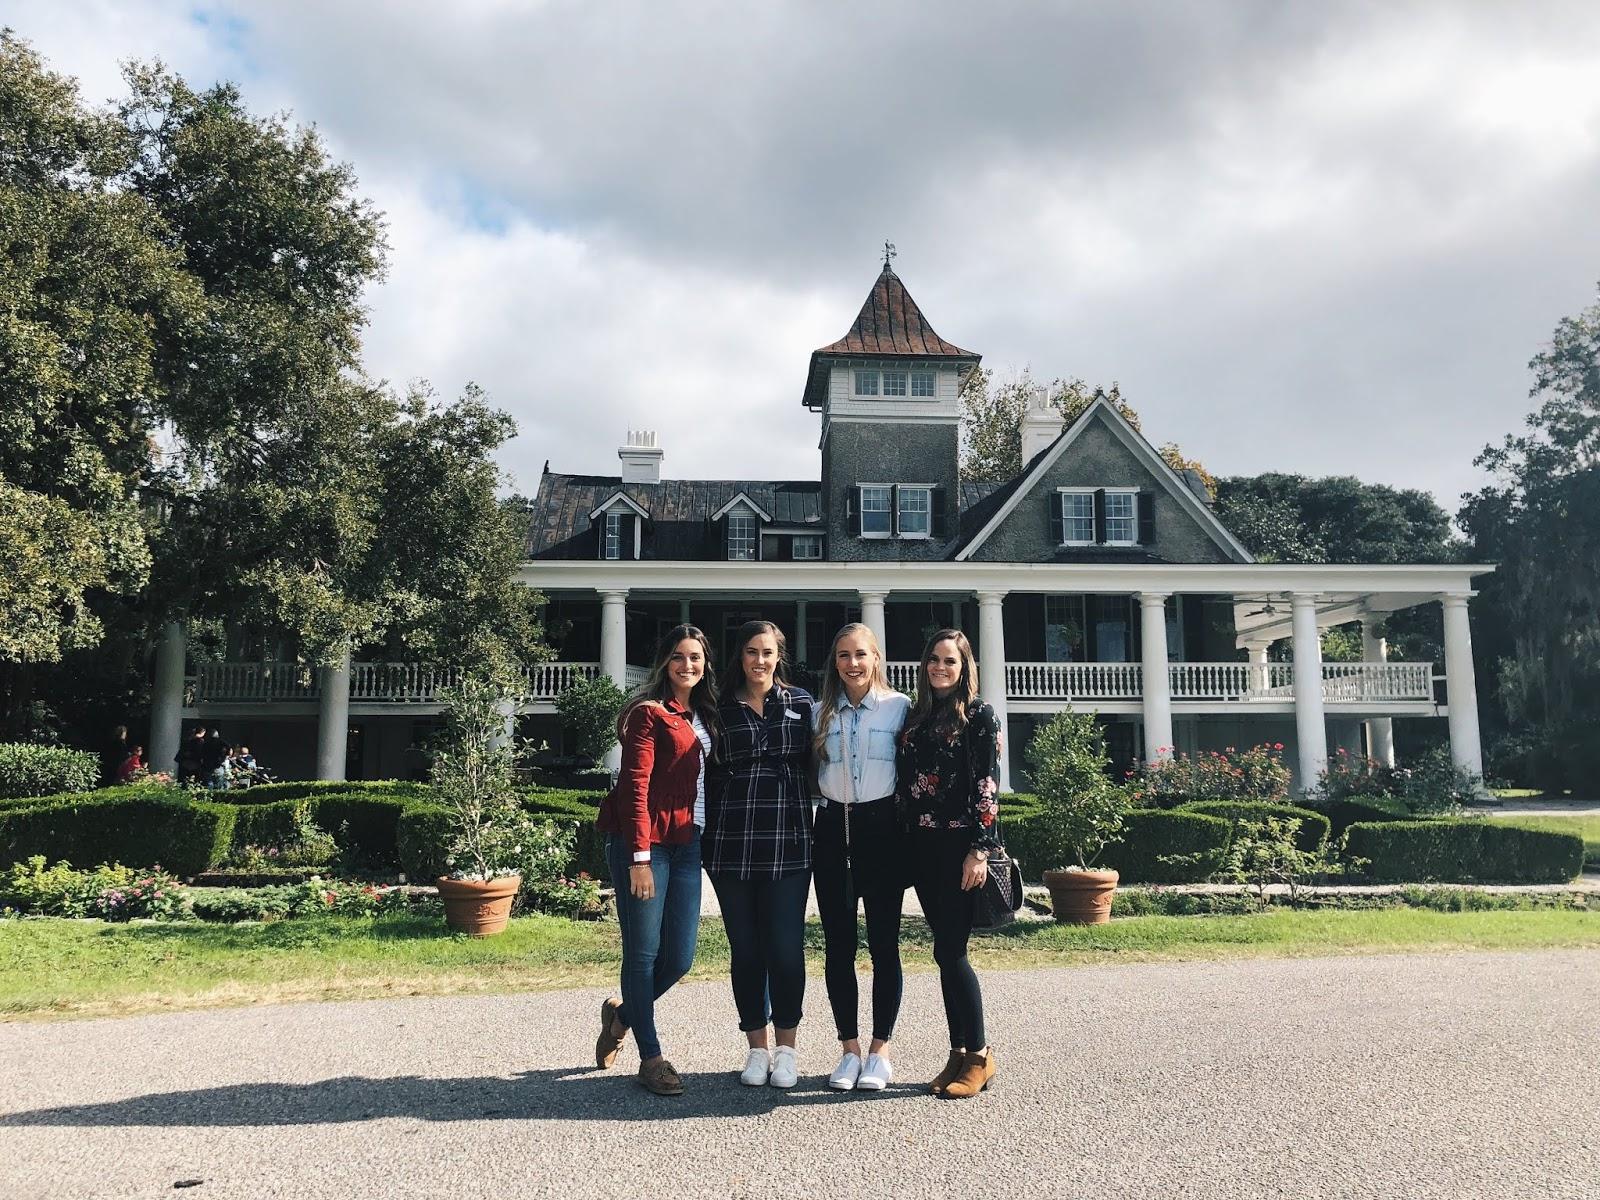 Friends at the Magnolia Plantation in Charleston, SC